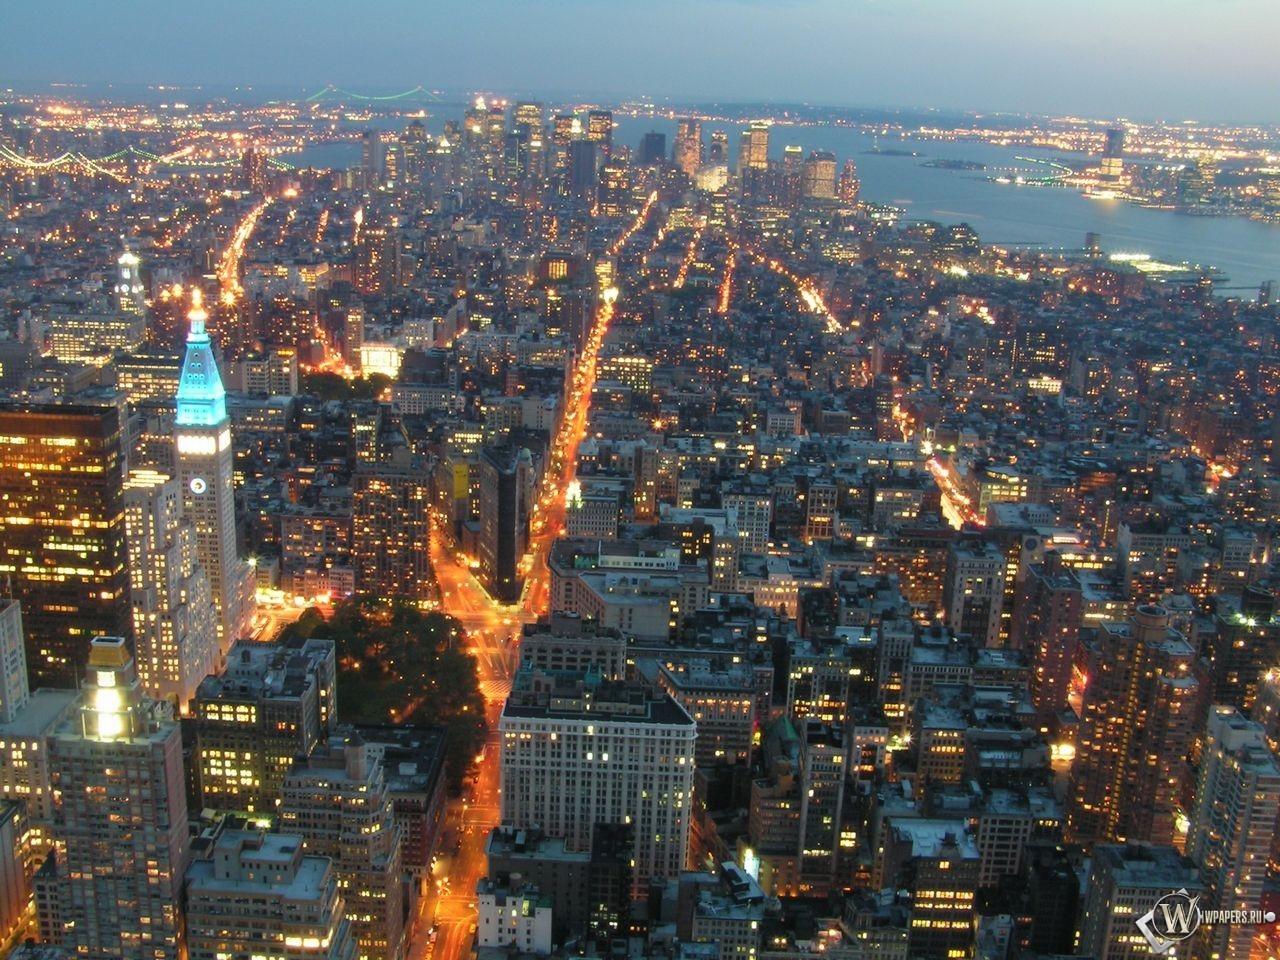 New York 7 1280x960